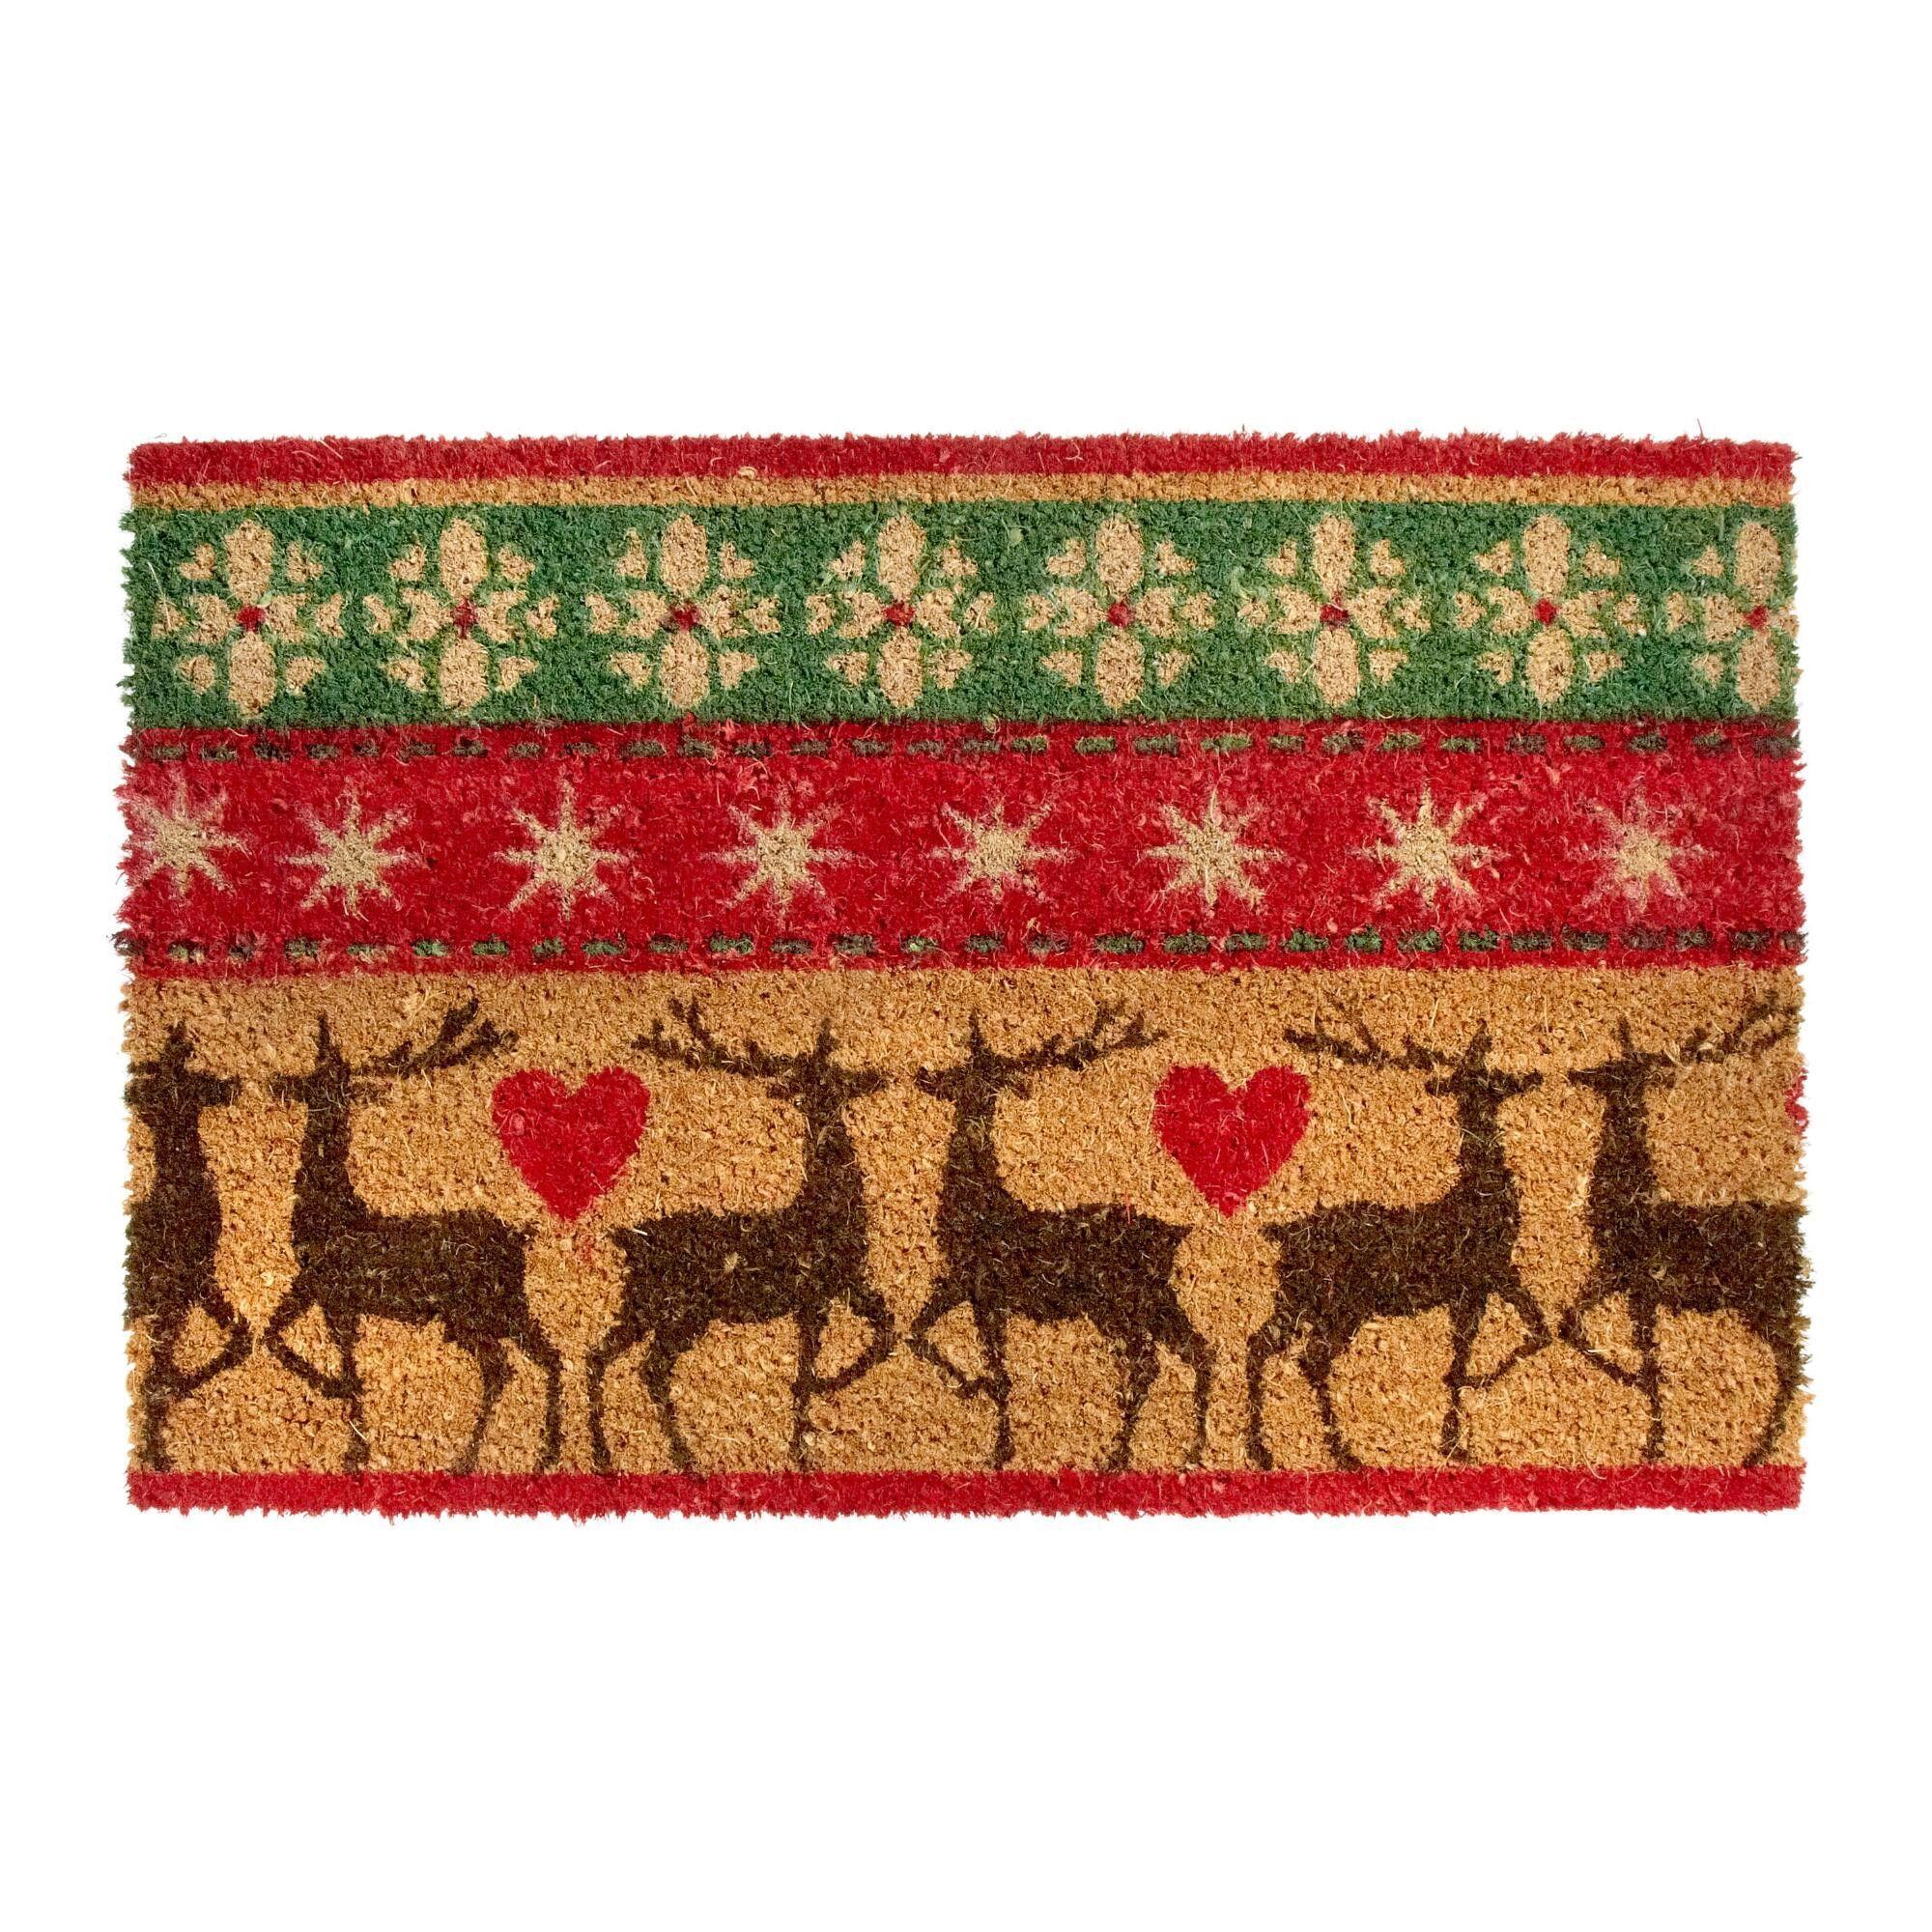 Incroyable Reindeer Fair Isle Coir Door Mat